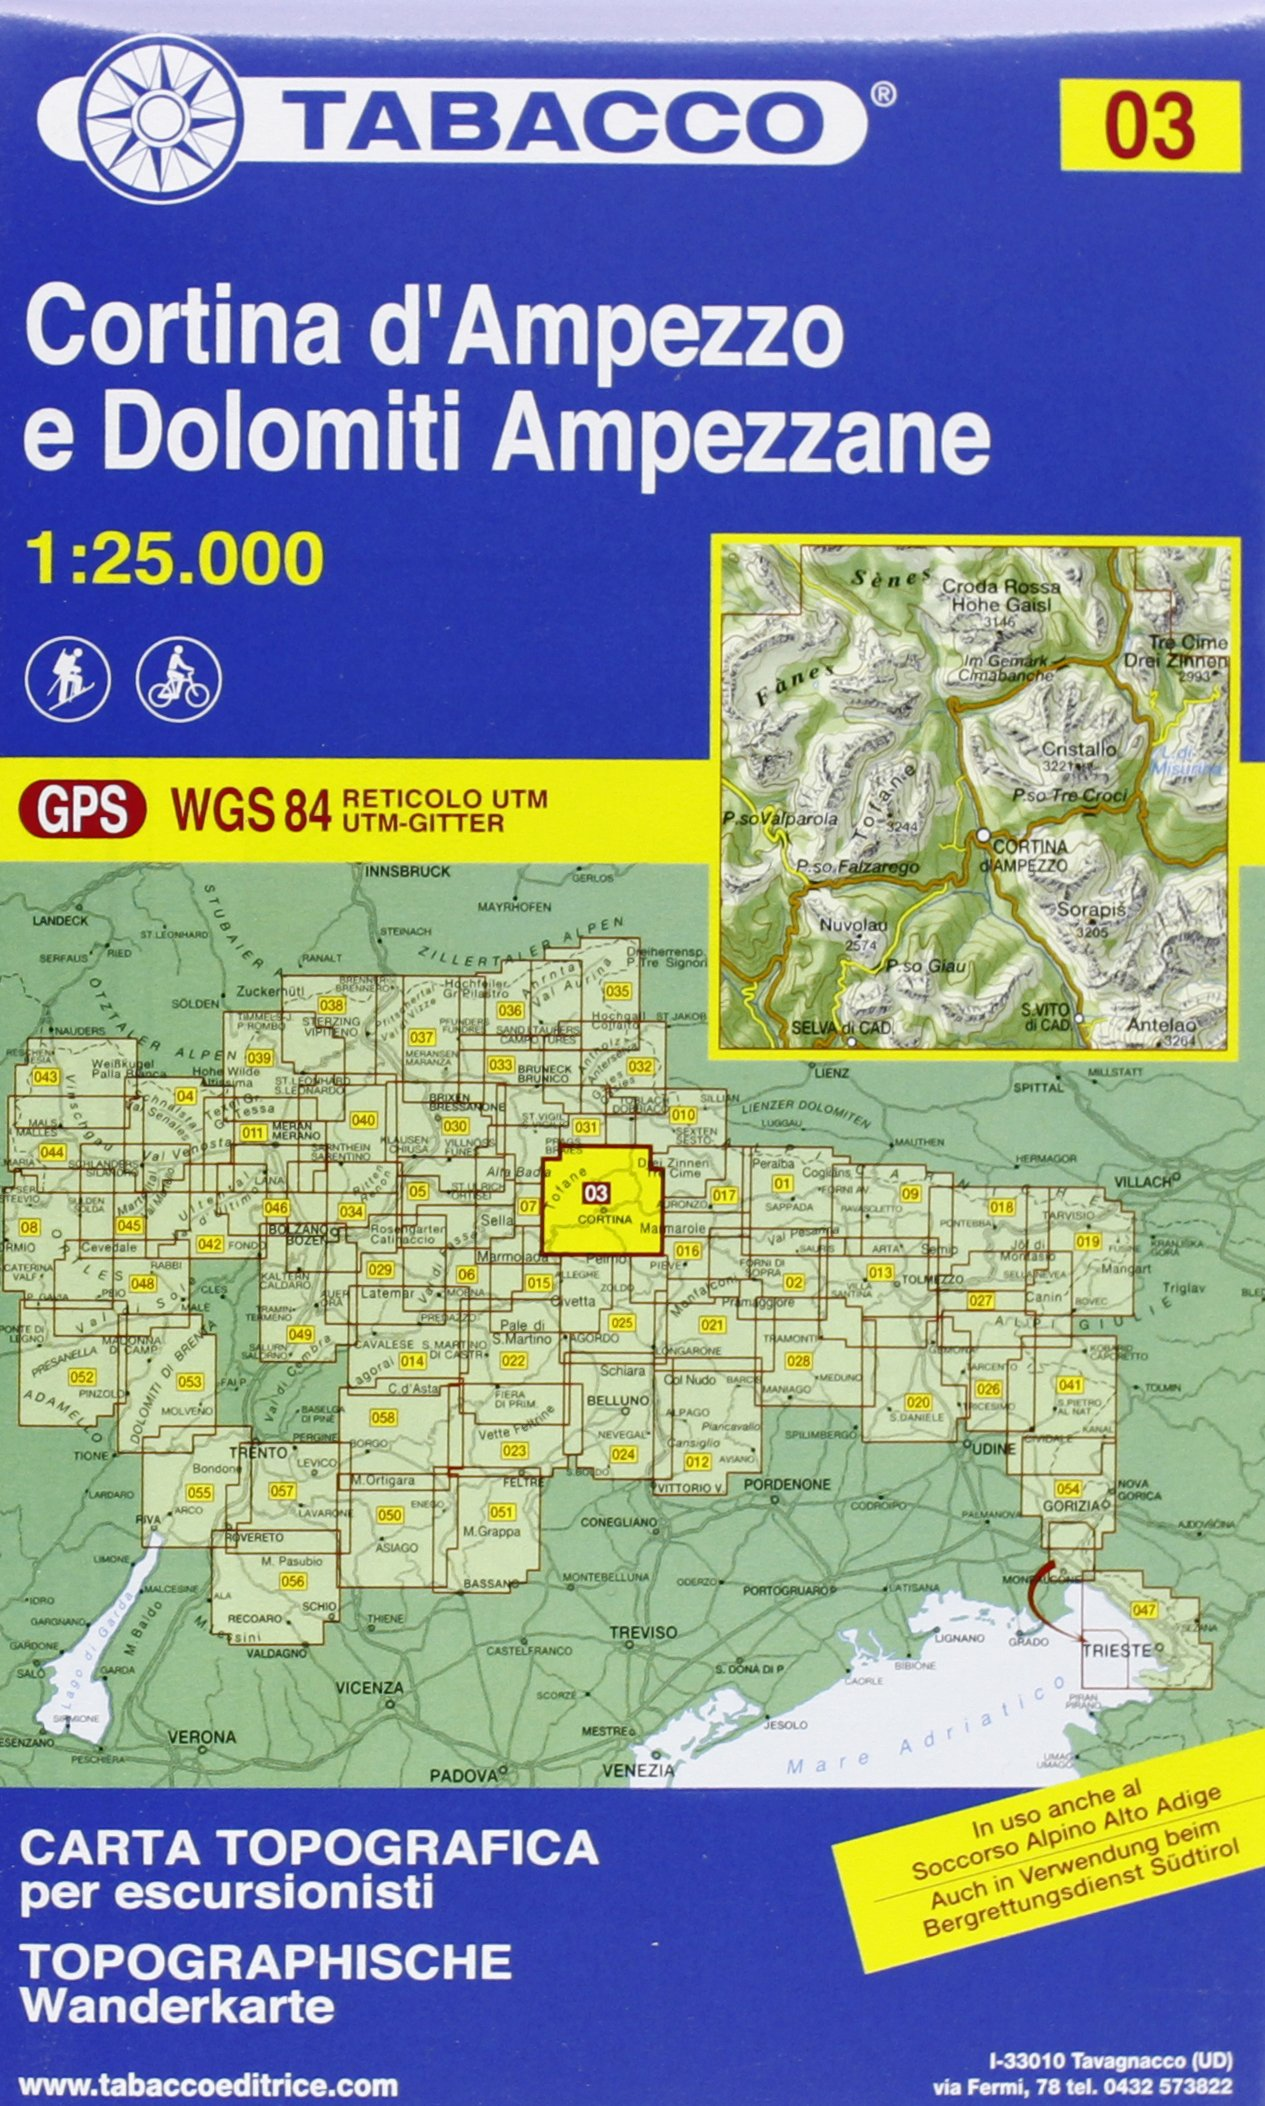 Cortina dAmpezzo 03 GPS Dolomiti Ampezzane Amazoncouk Tabacco